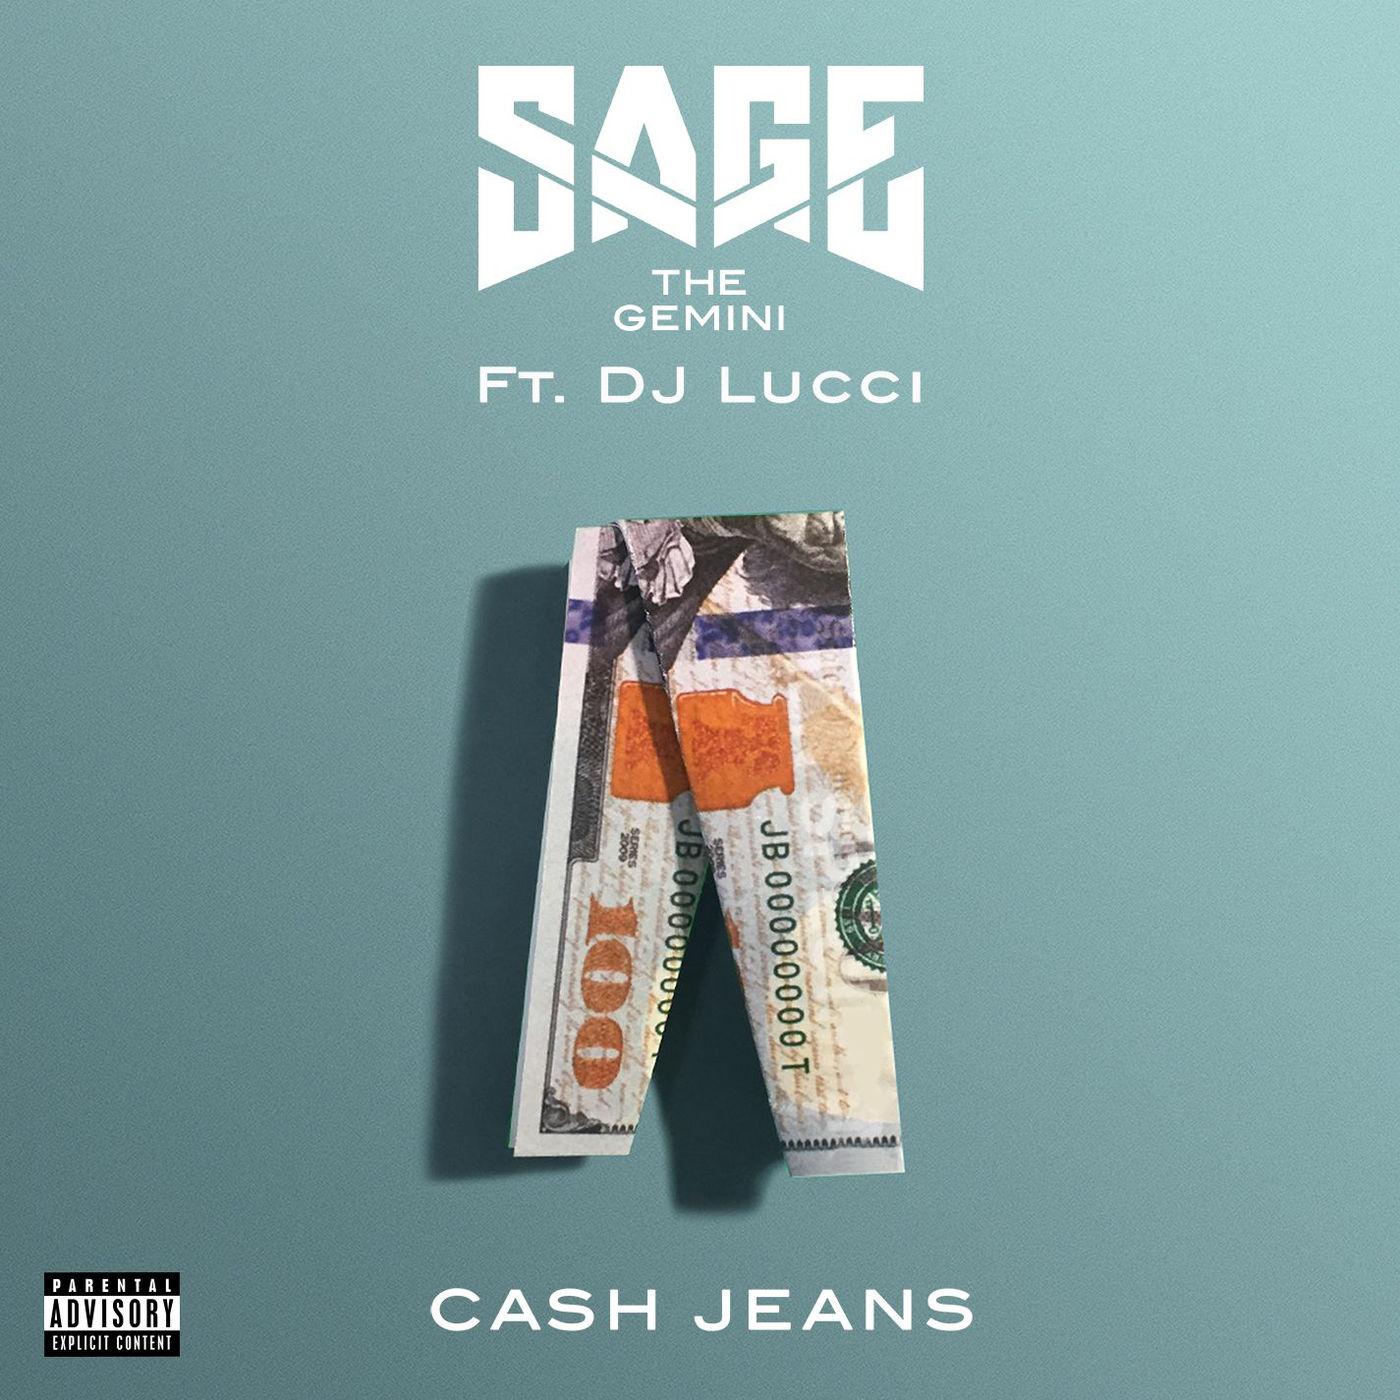 Sage the Gemini - Cash Jeans (feat. DJ Lucci) - Single Cover